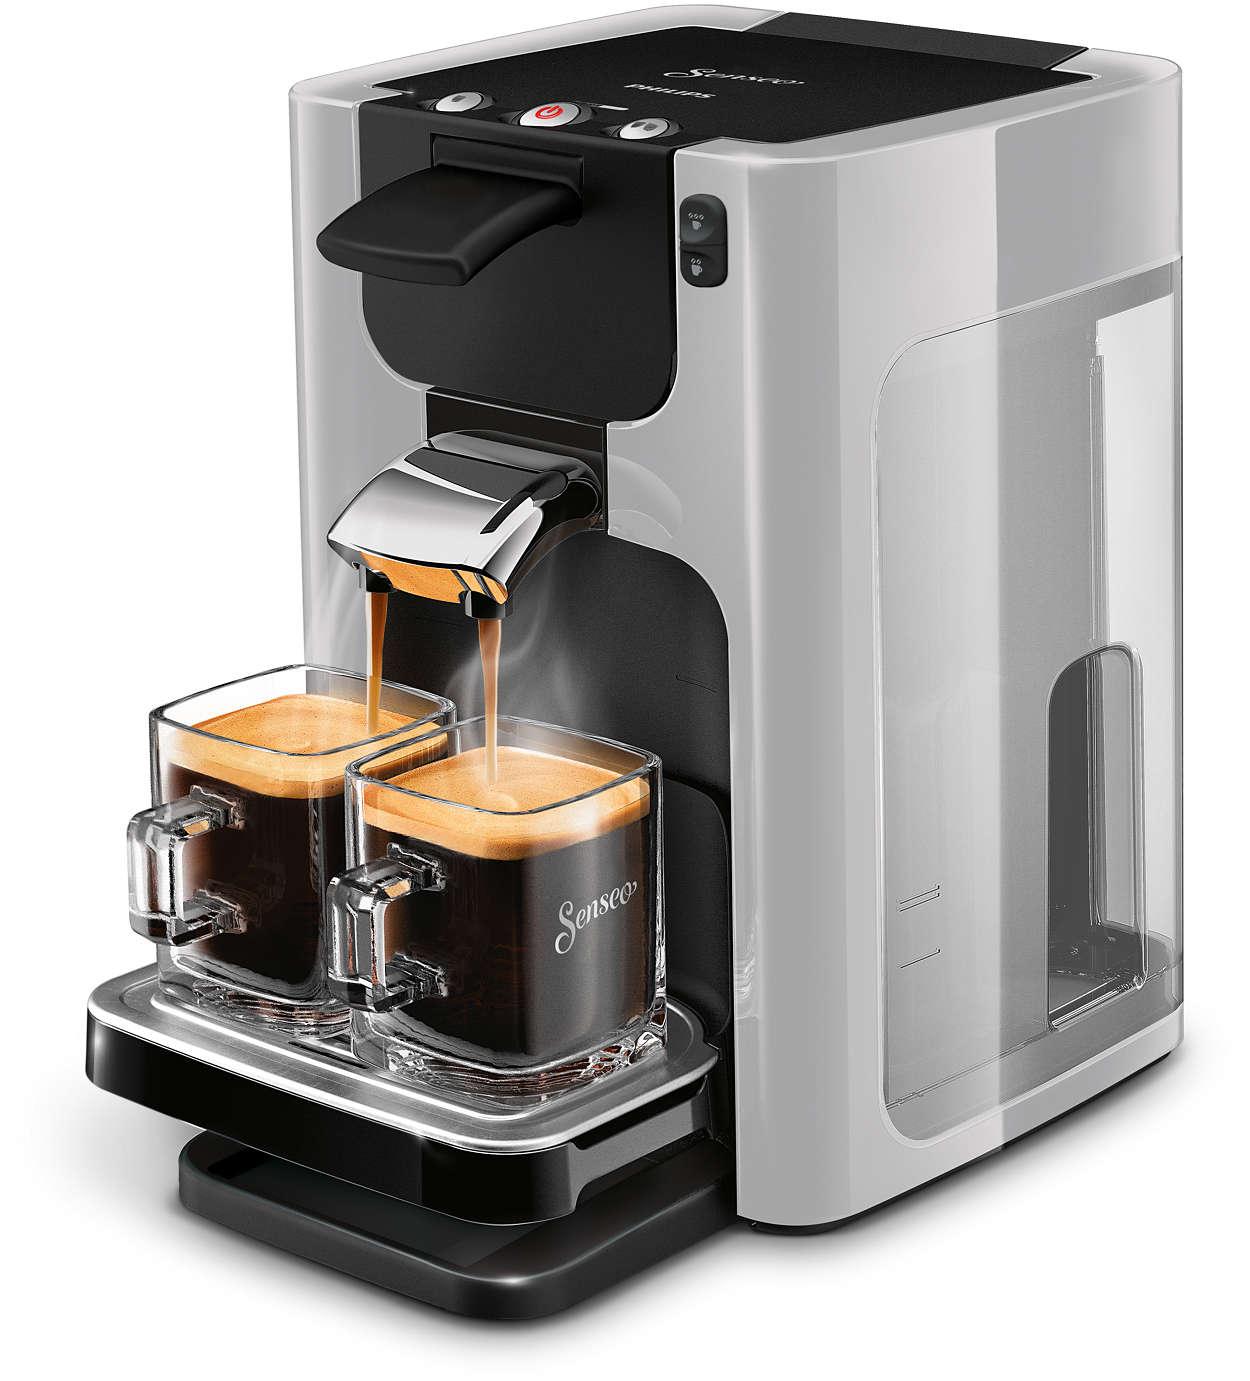 quadrante machine caf dosettes hd7866 11 senseo. Black Bedroom Furniture Sets. Home Design Ideas